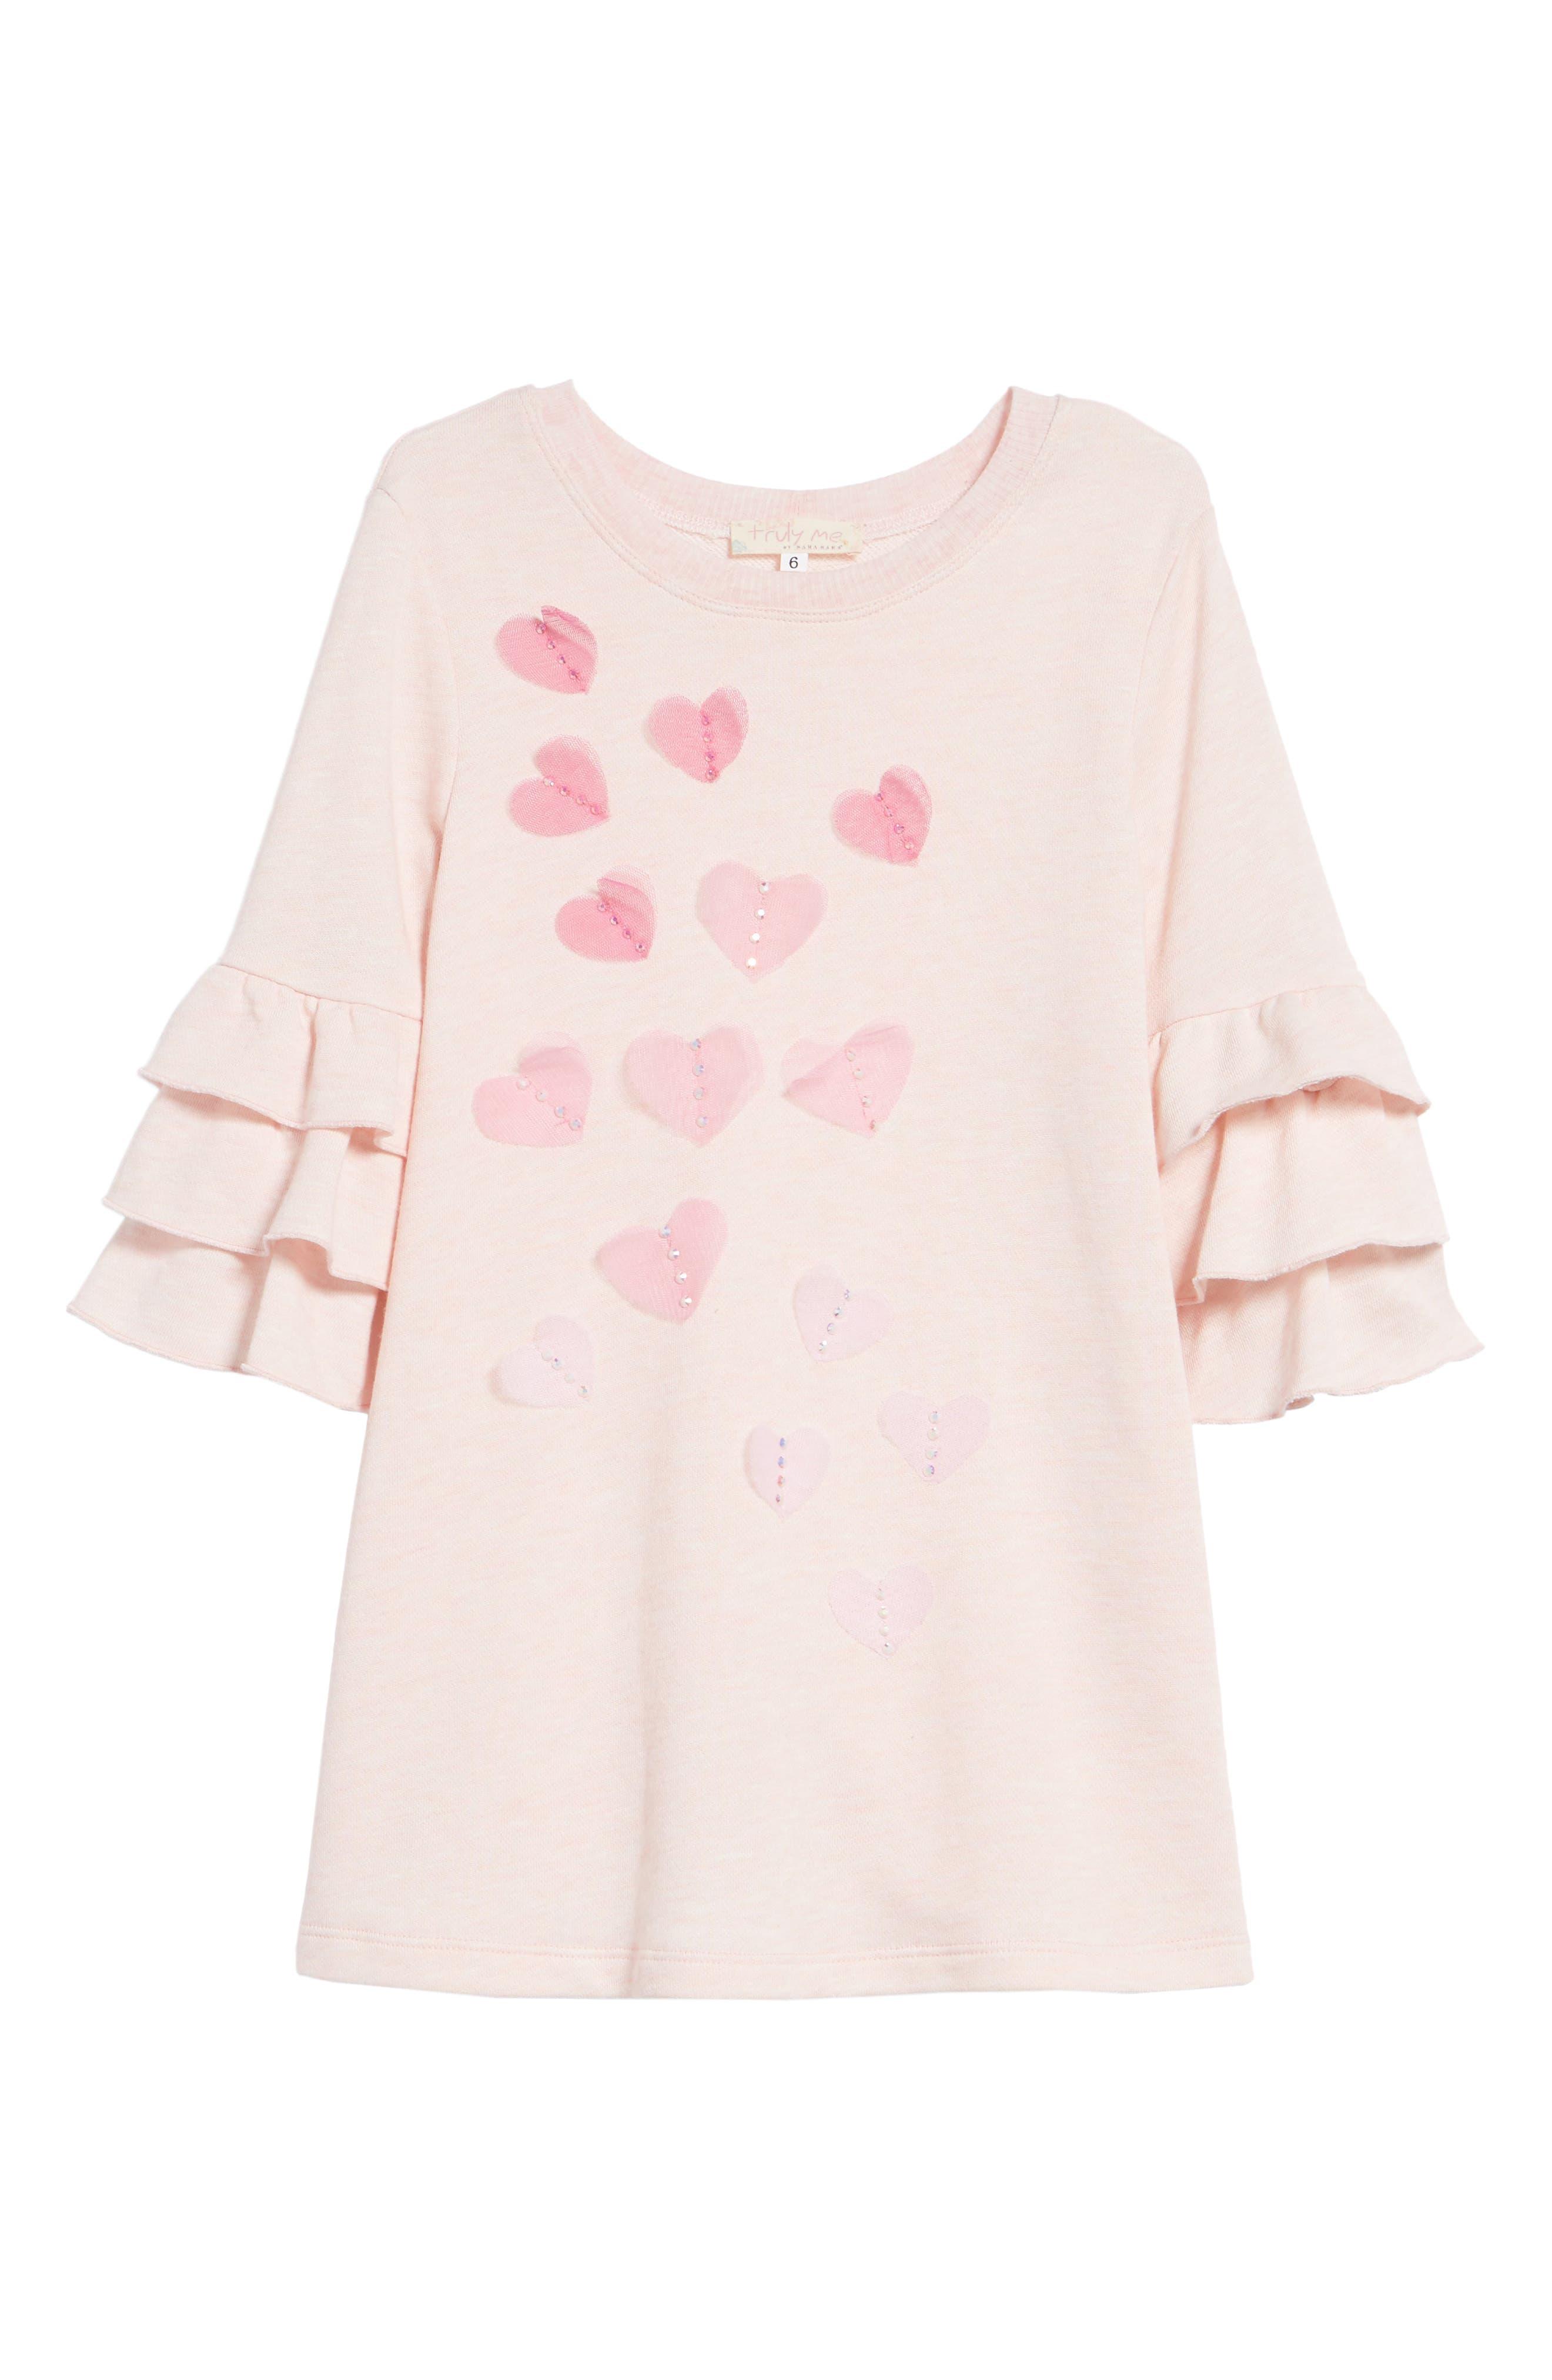 Alternate Image 1 Selected - Truly Me Ruffle Sleeve Dress (Toddler Girls & Little Girls)